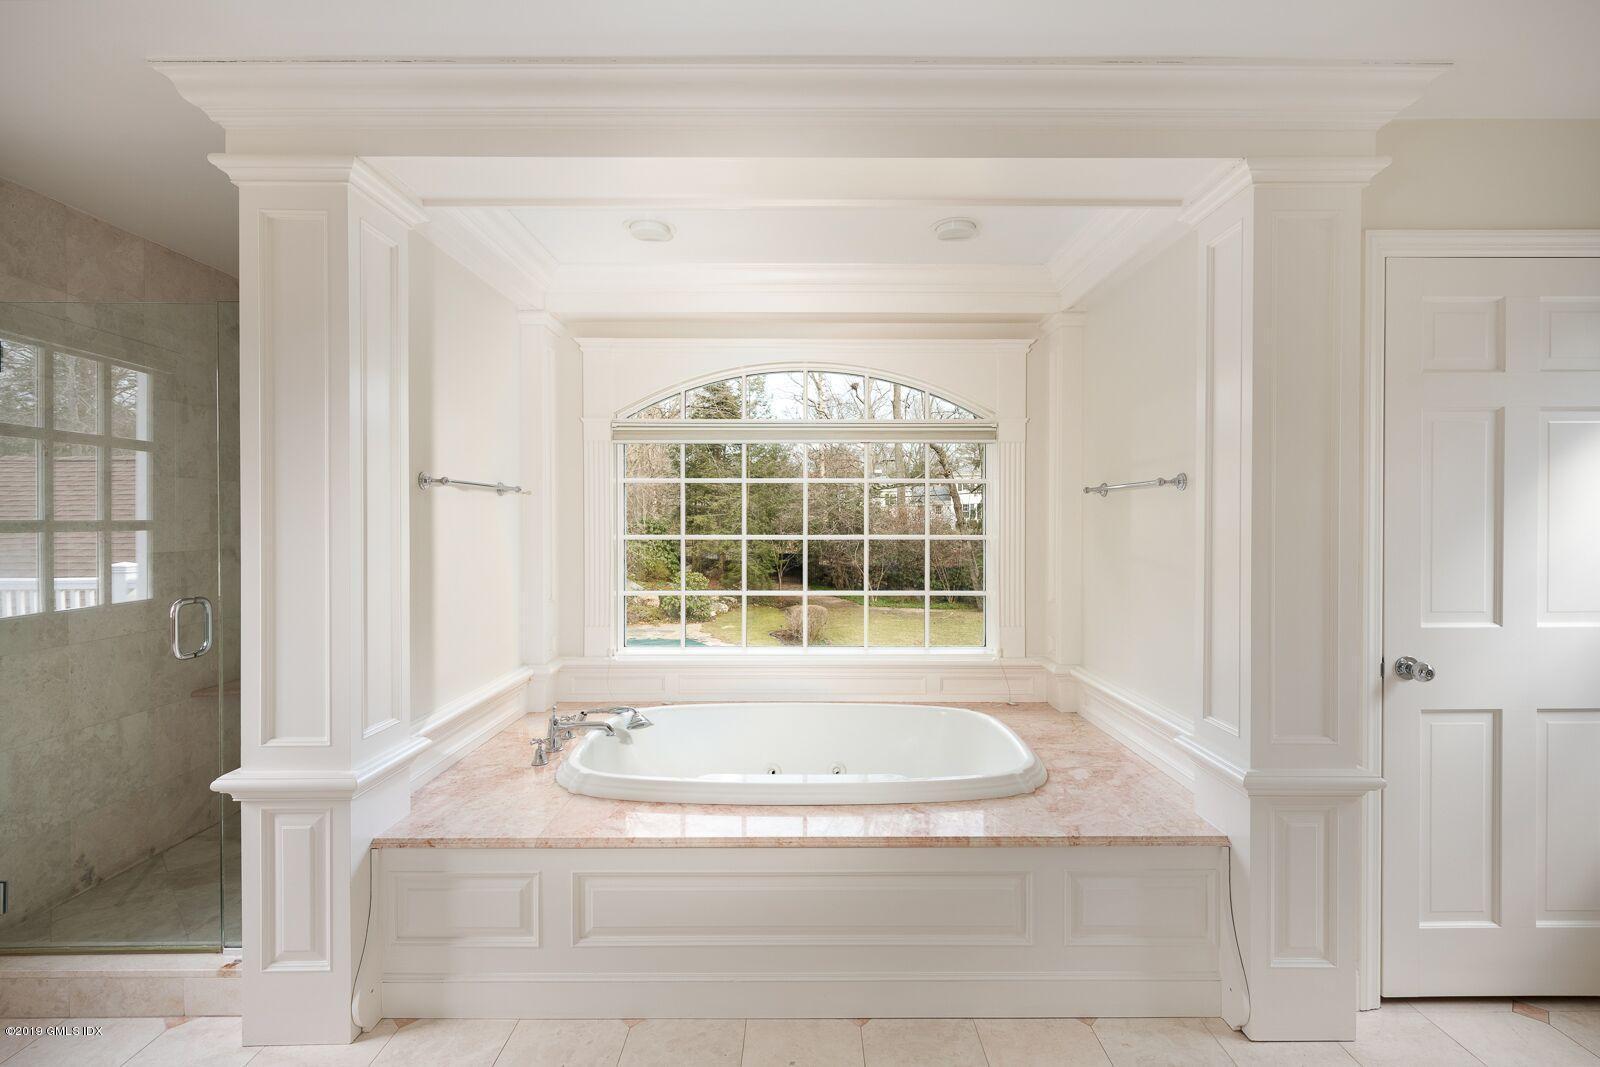 35 Copper Beech Road,Greenwich,Connecticut 06830,4 Bedrooms Bedrooms,3 BathroomsBathrooms,Single family,Copper Beech,105442